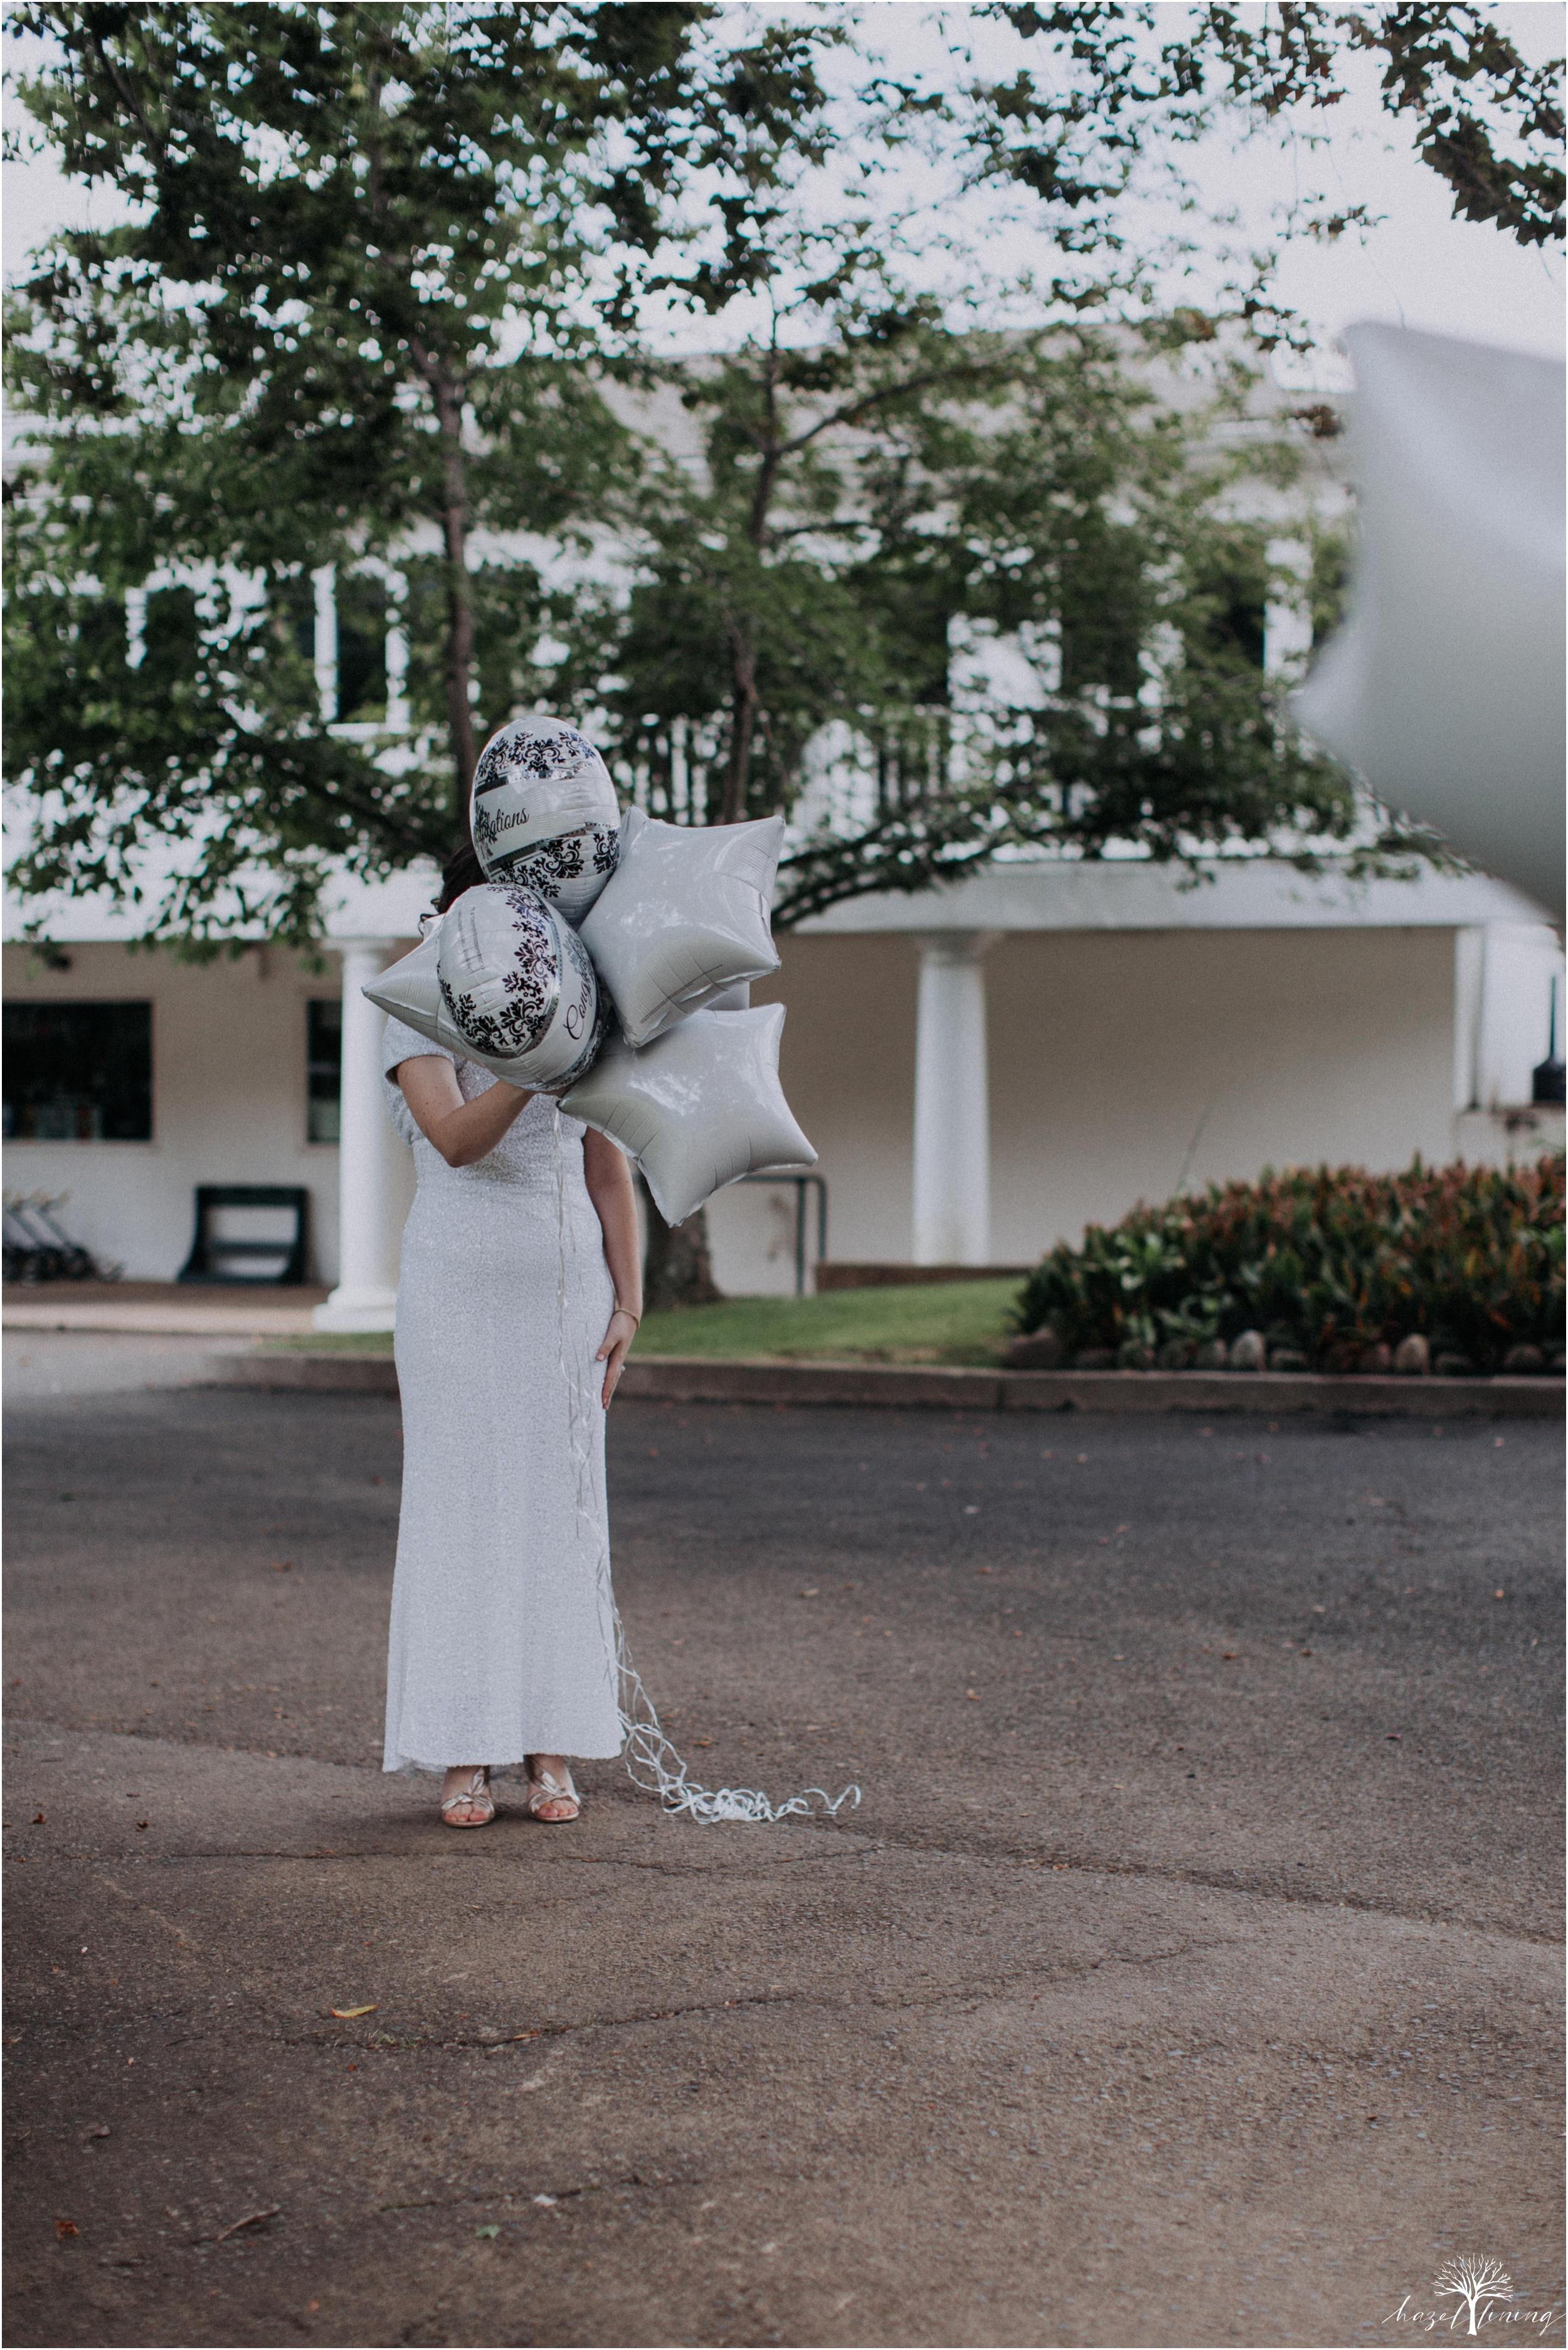 elizabeth-doelp-andrew-foreback-middletown-country-club-summer-langhorne-pennsylvania-wedding-hazel-lining-travel-wedding-elopement-photography_0027.jpg